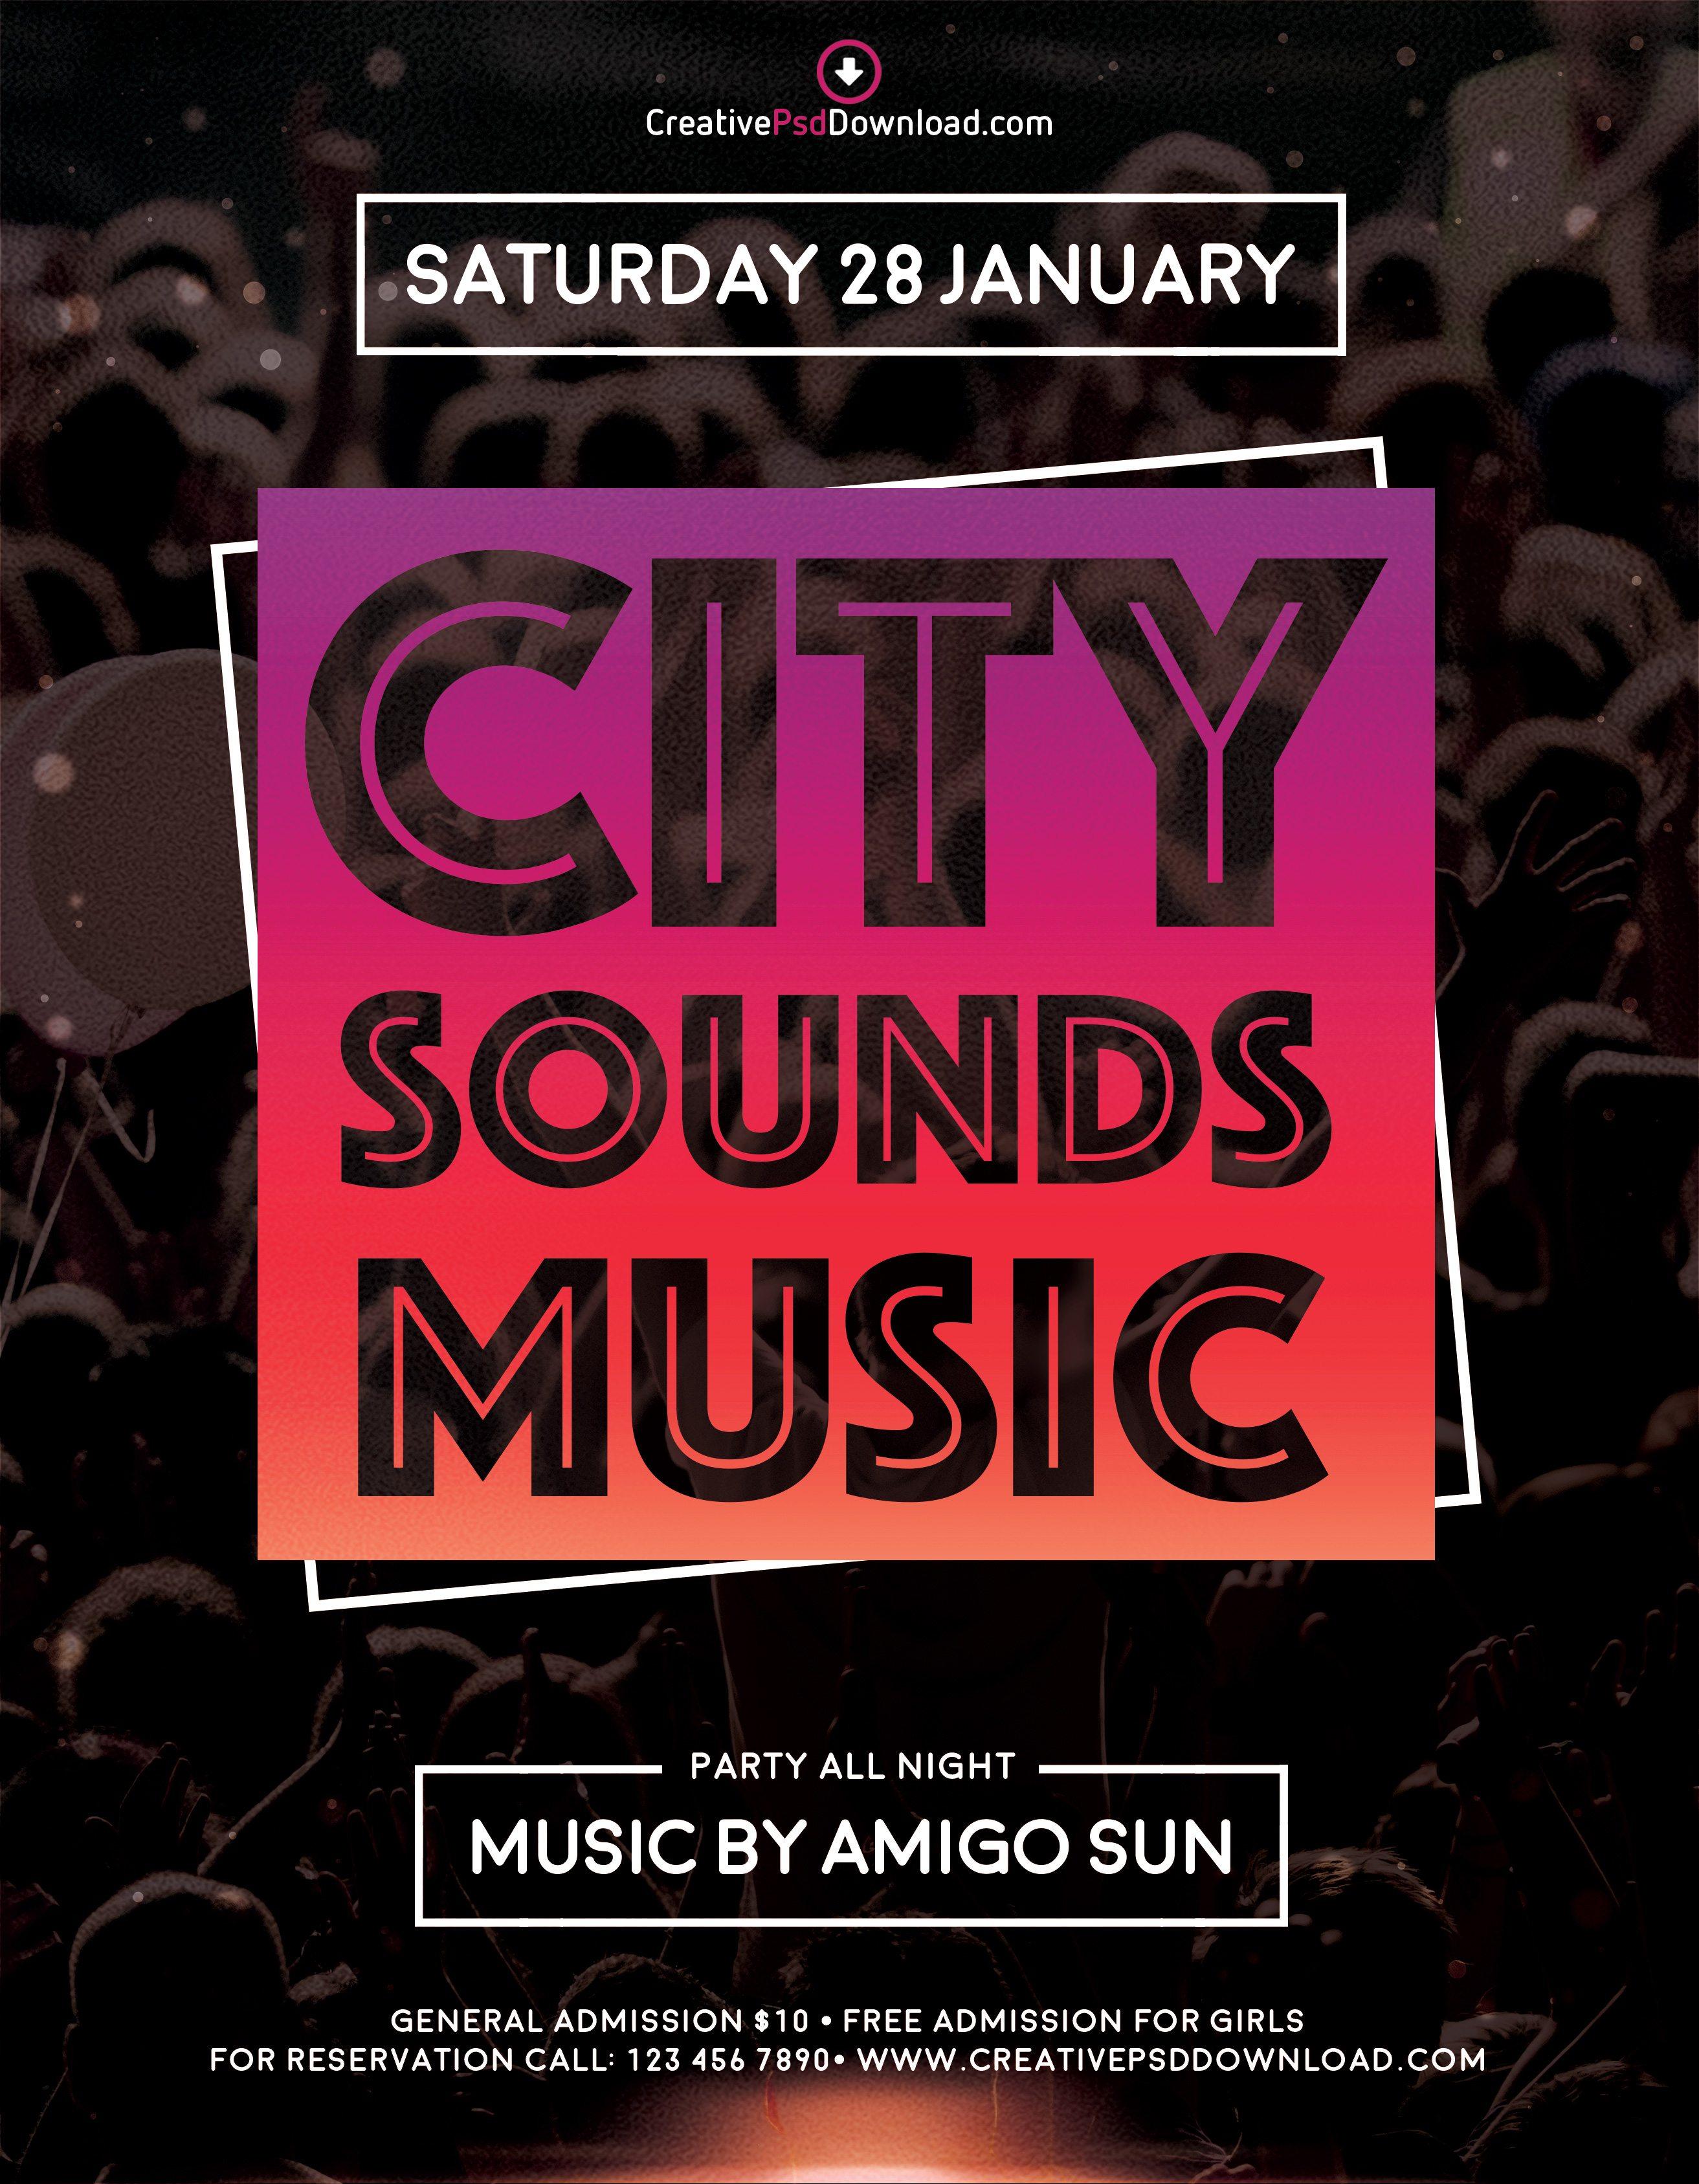 City Sounds Music Premium Flyer Template